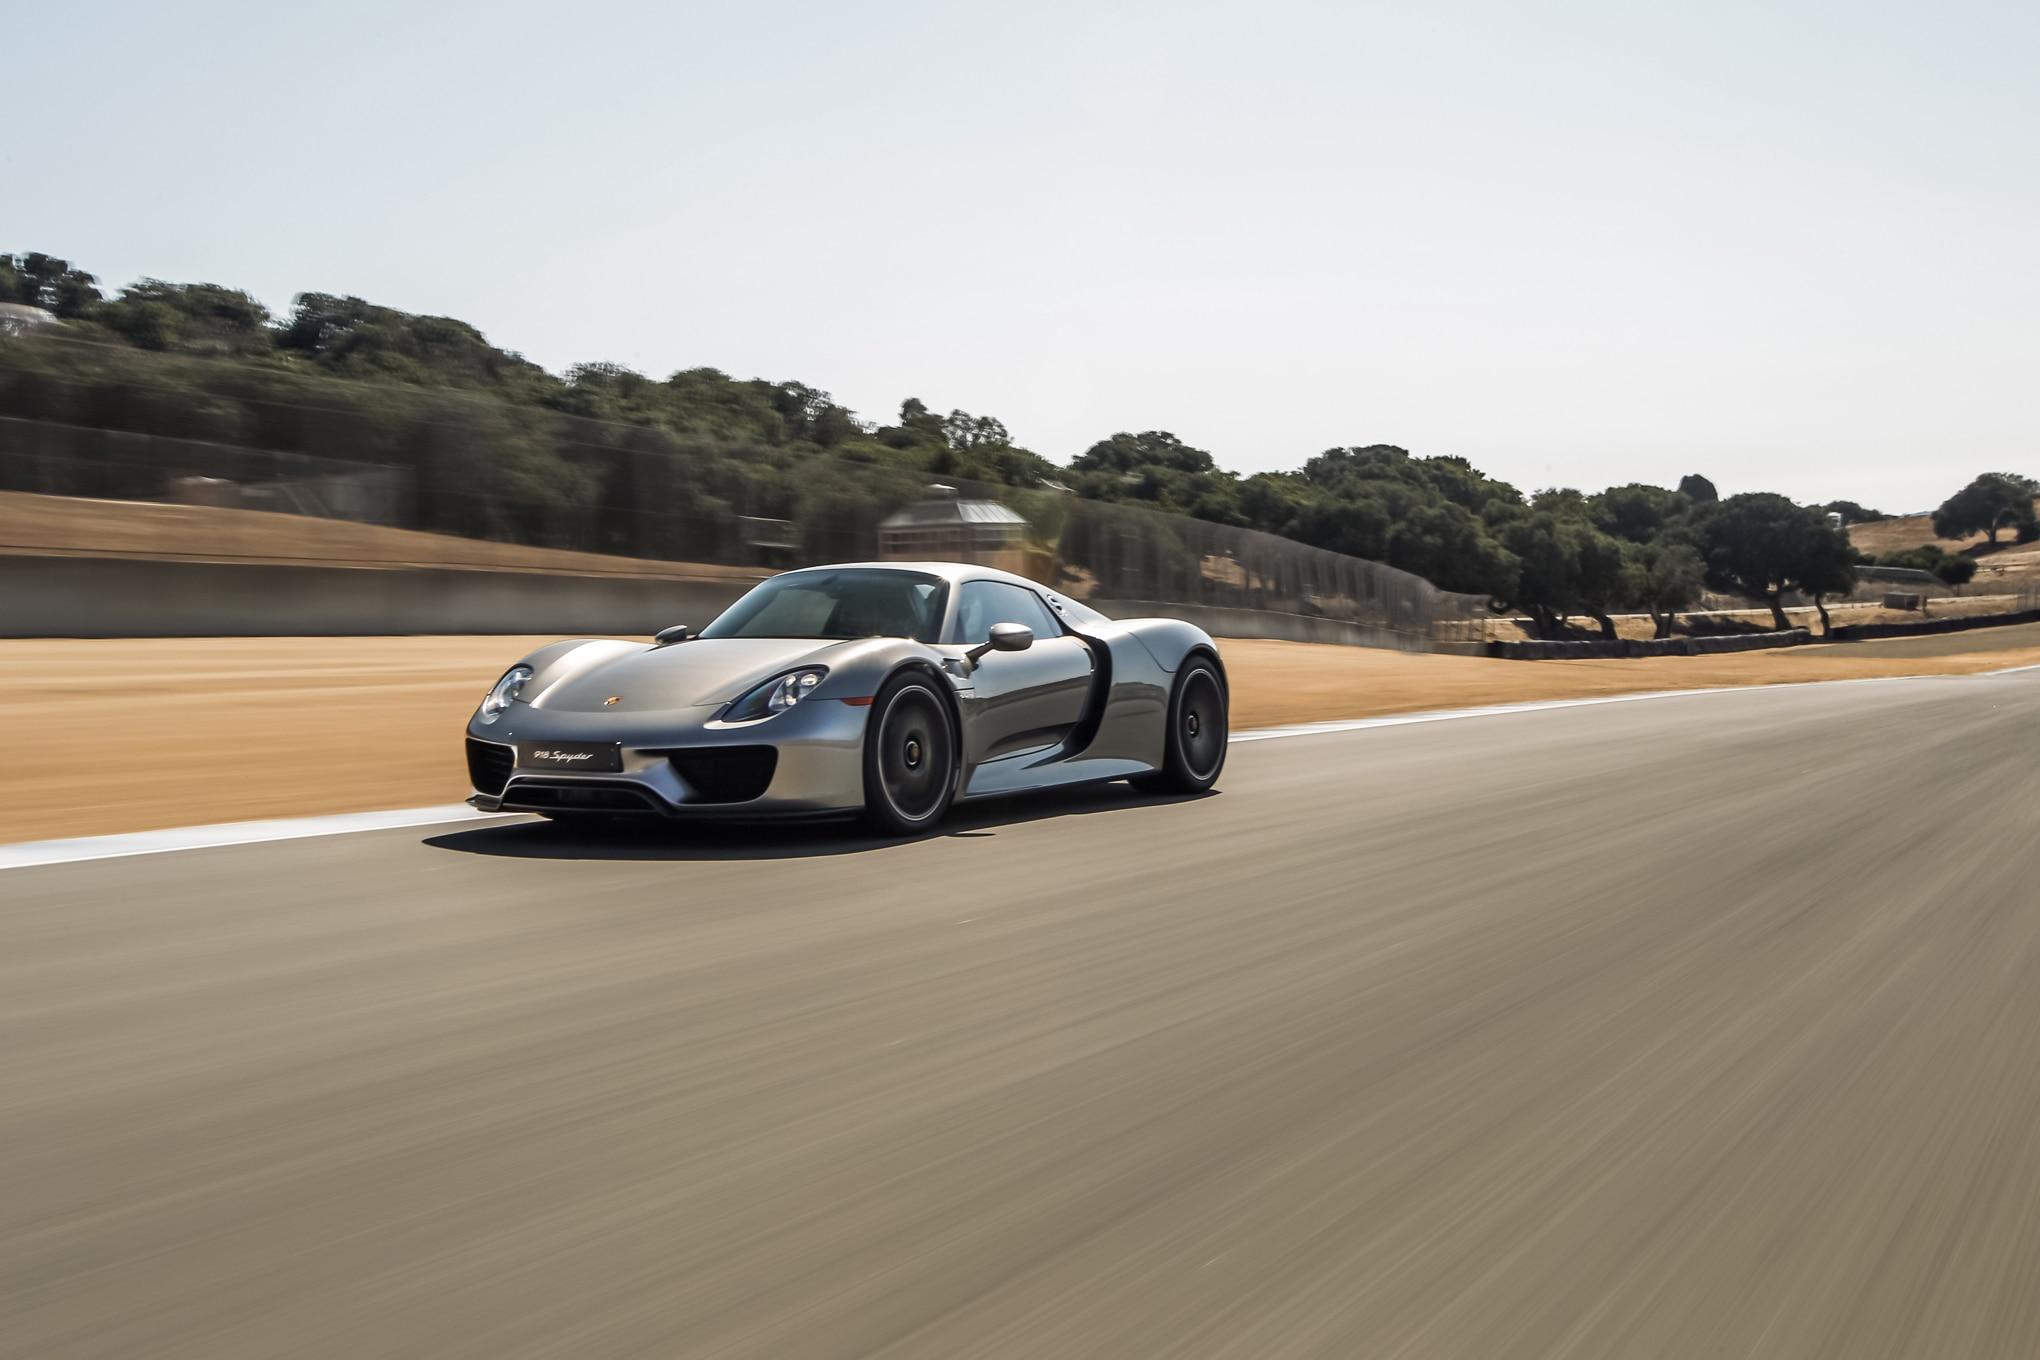 2015-Porsche-918-Spyder-front-three-quarters-in-motion Inspiring 2015 Porsche 918 Spyder Quarter Mile Cars Trend